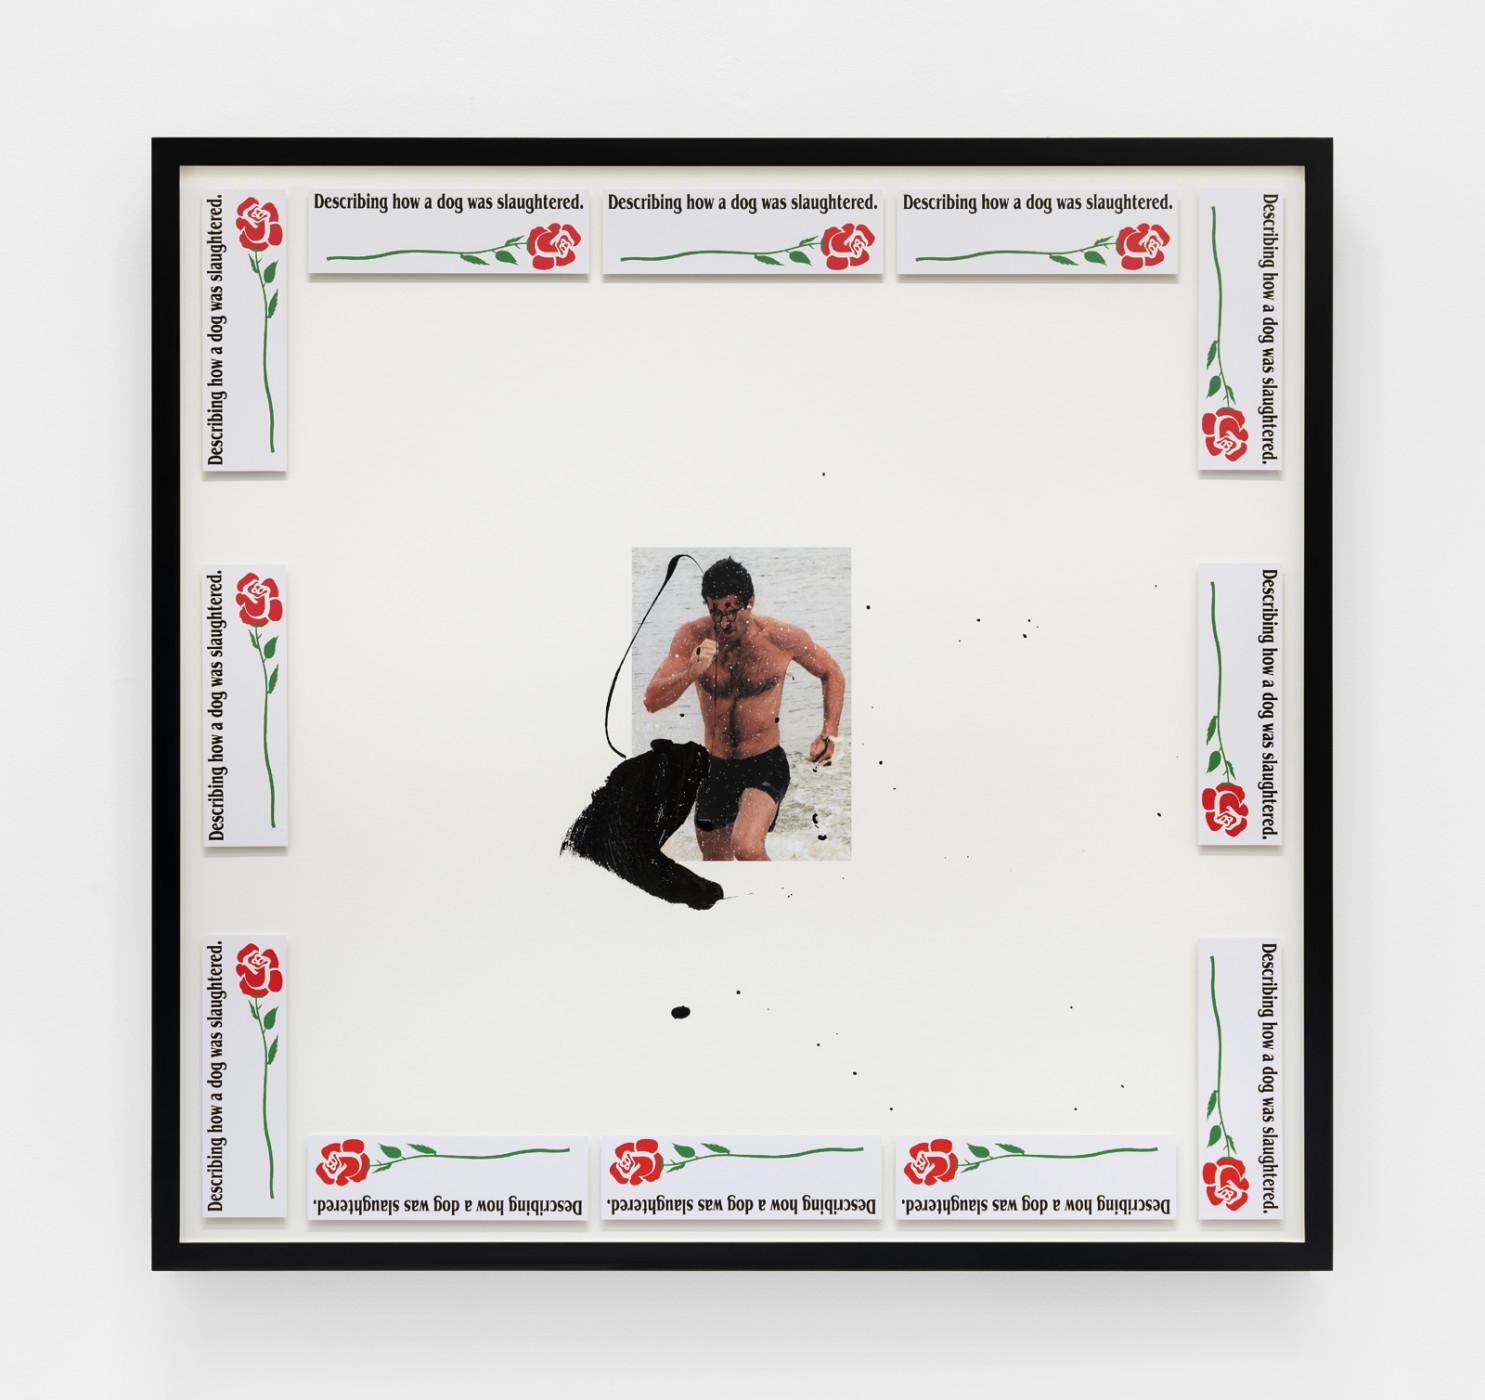 "<div class=""artwork_caption""><p><em>Untitled</em>, 2020</p><p>inkjet print, water based enamel, adhesive media in powder coated aluminium frame</p><p>site size: 96.5 x 102 cm / 38 x 40 in<br />frame size: 101.8 x 106.8 x 7.8 cm / 40 ⅛ x 42 ⅛ x 3 ⅛ in</p></div>"